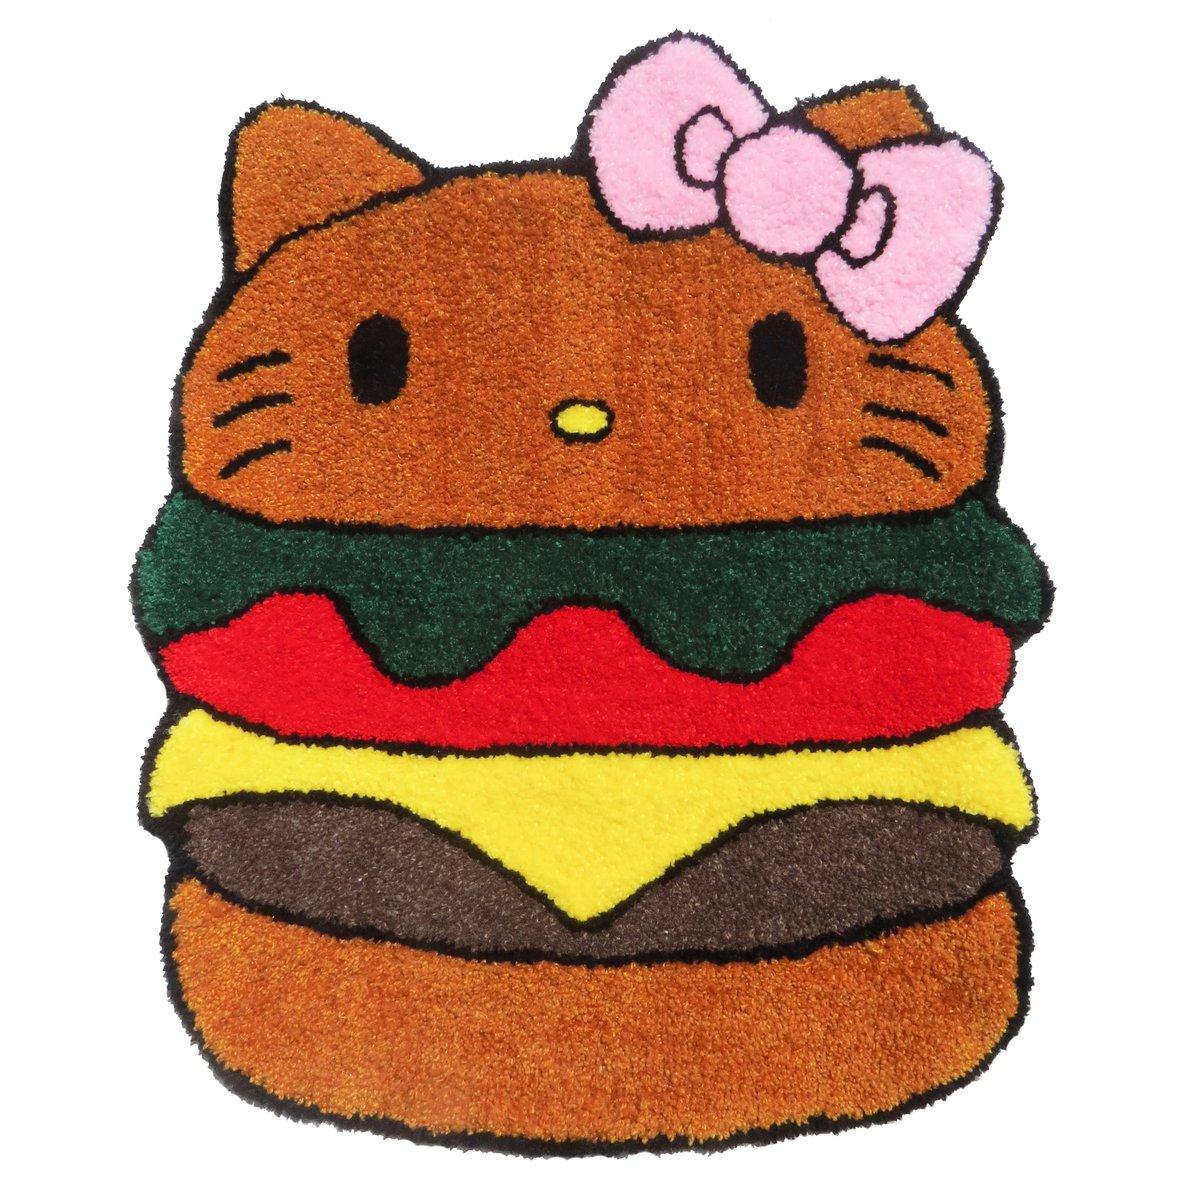 HELLO KITTY HAMBURGER RUG